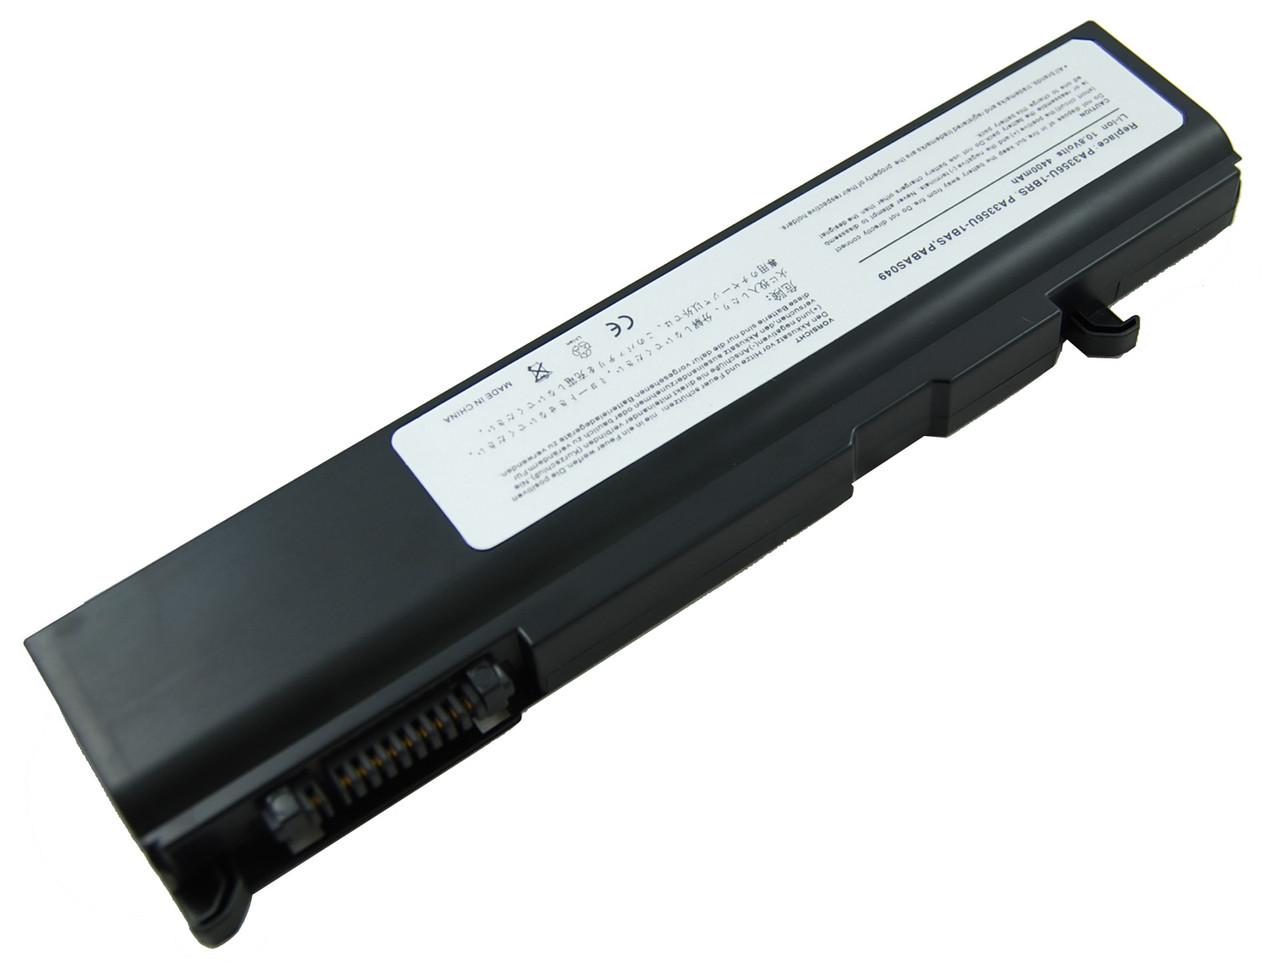 Аккумулятор для ноутбука Toshiba PA3356U-3BAS